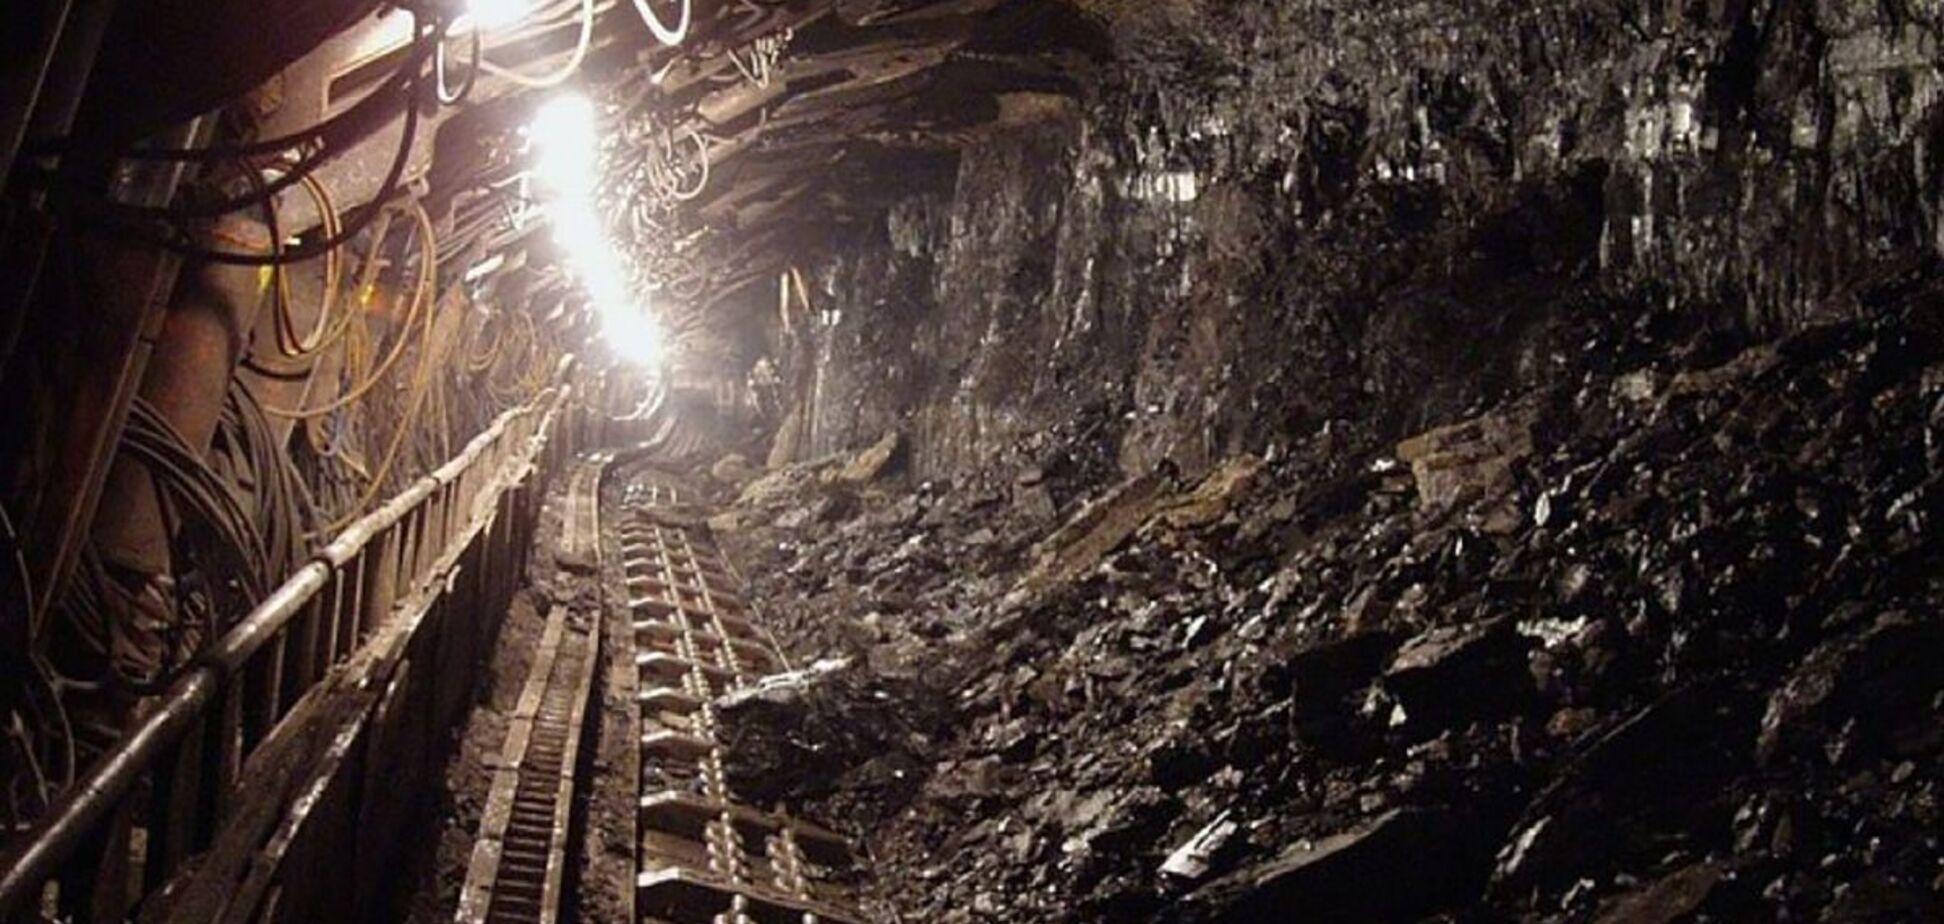 Импорт тока с РФ и Беларуси привел к миллиардному долгу перед шахтерами, – Гриб